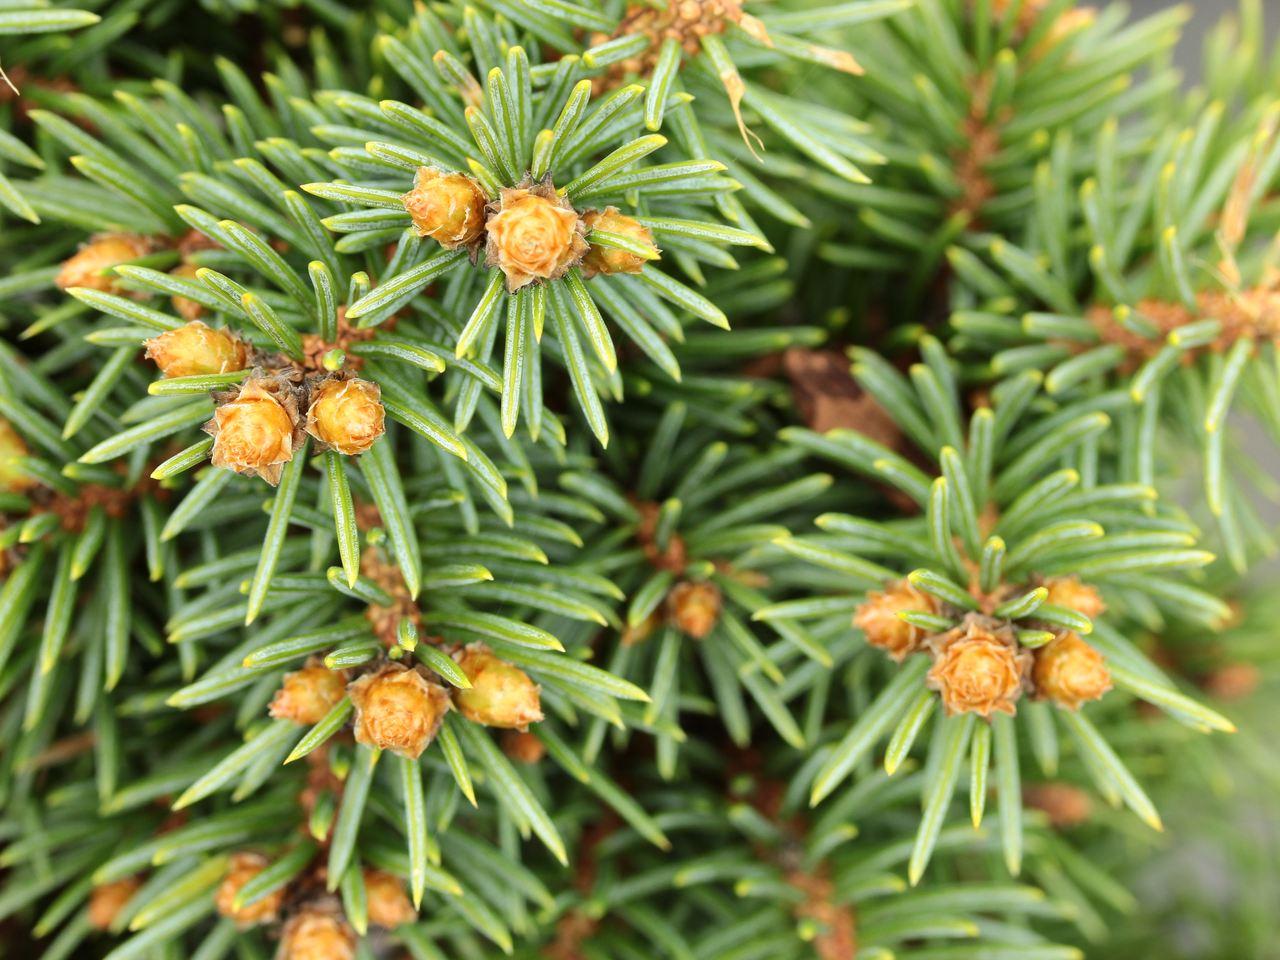 Picea pungens Green Globe spruce evergreen conifer green needles dwarf subalpine